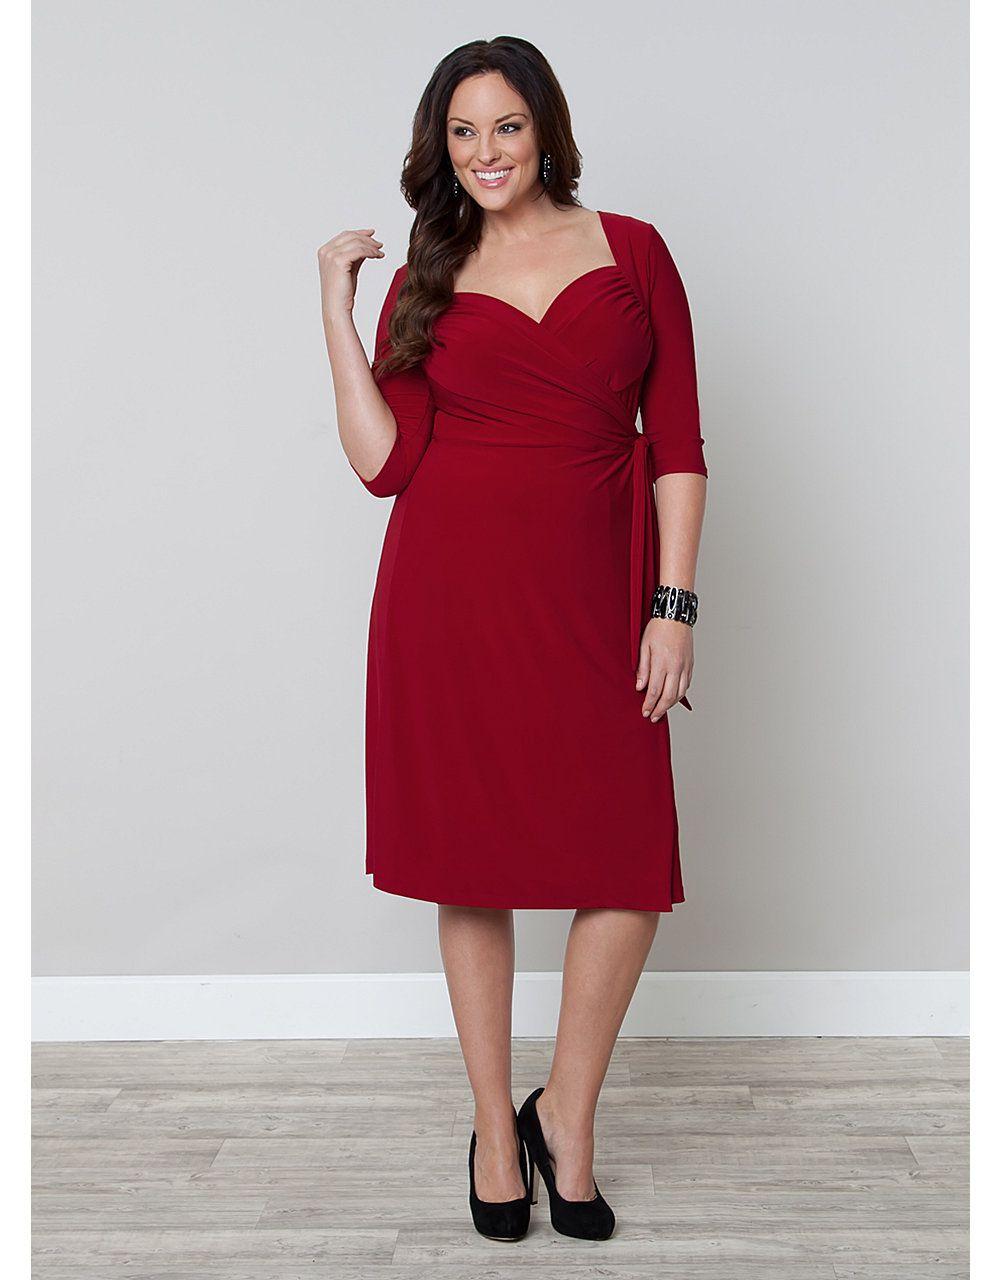 Flattering wedding dresses for plus size  Sweetheart Knit Wrap Dress  Lane Bryant  So Pretty Plus Size